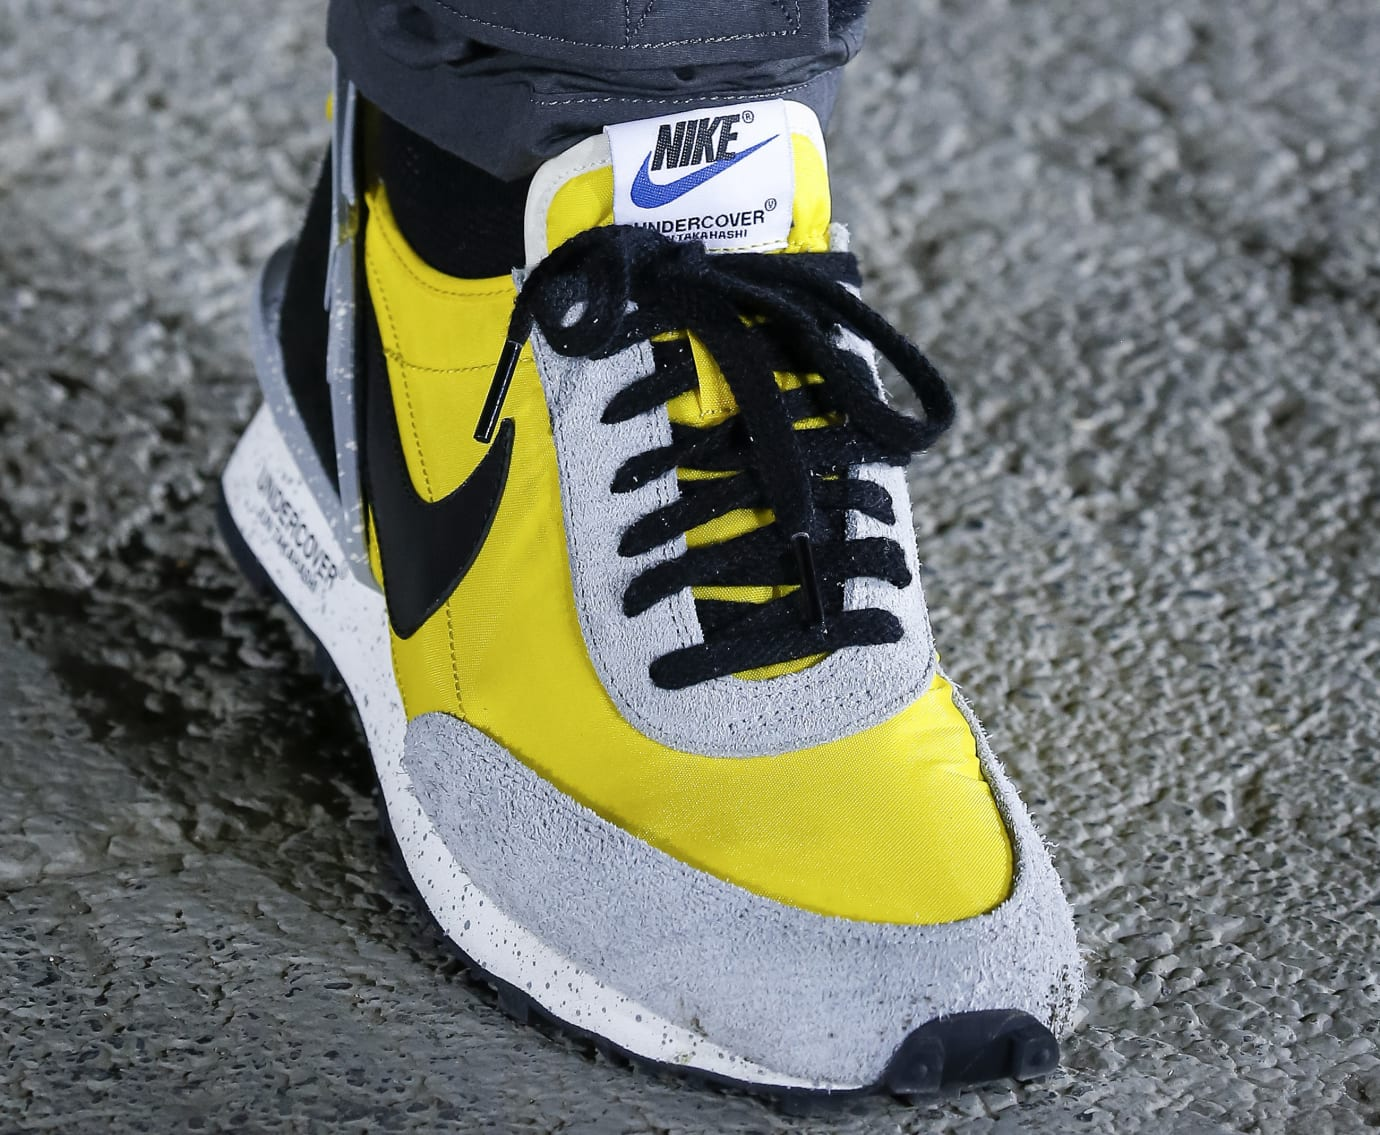 Undercover x Nike Paris Fashion Week Yellow Low-Top